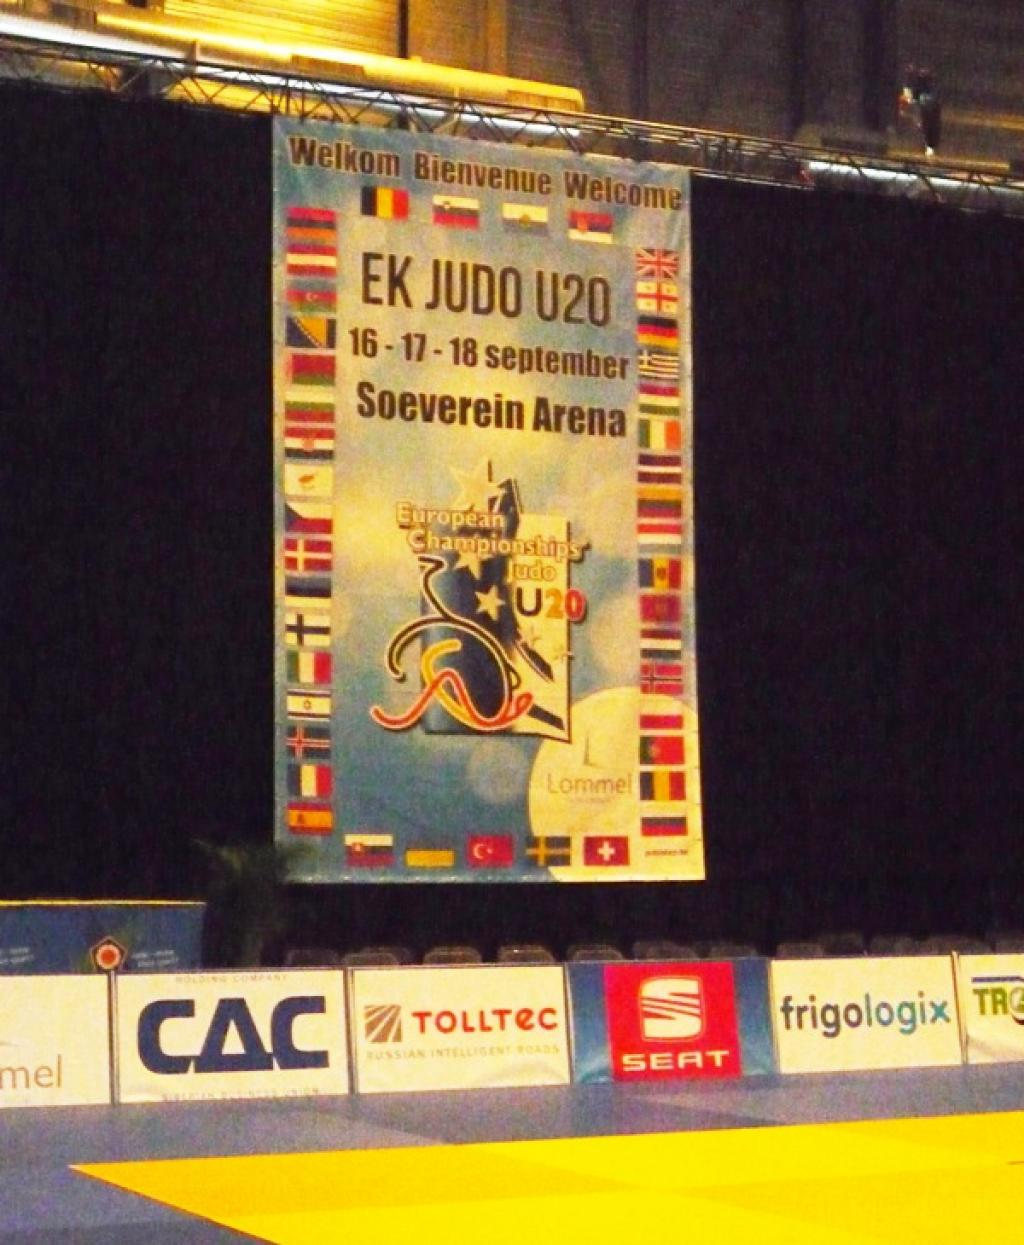 Preview European U20 Championships in Lommel, Belgium